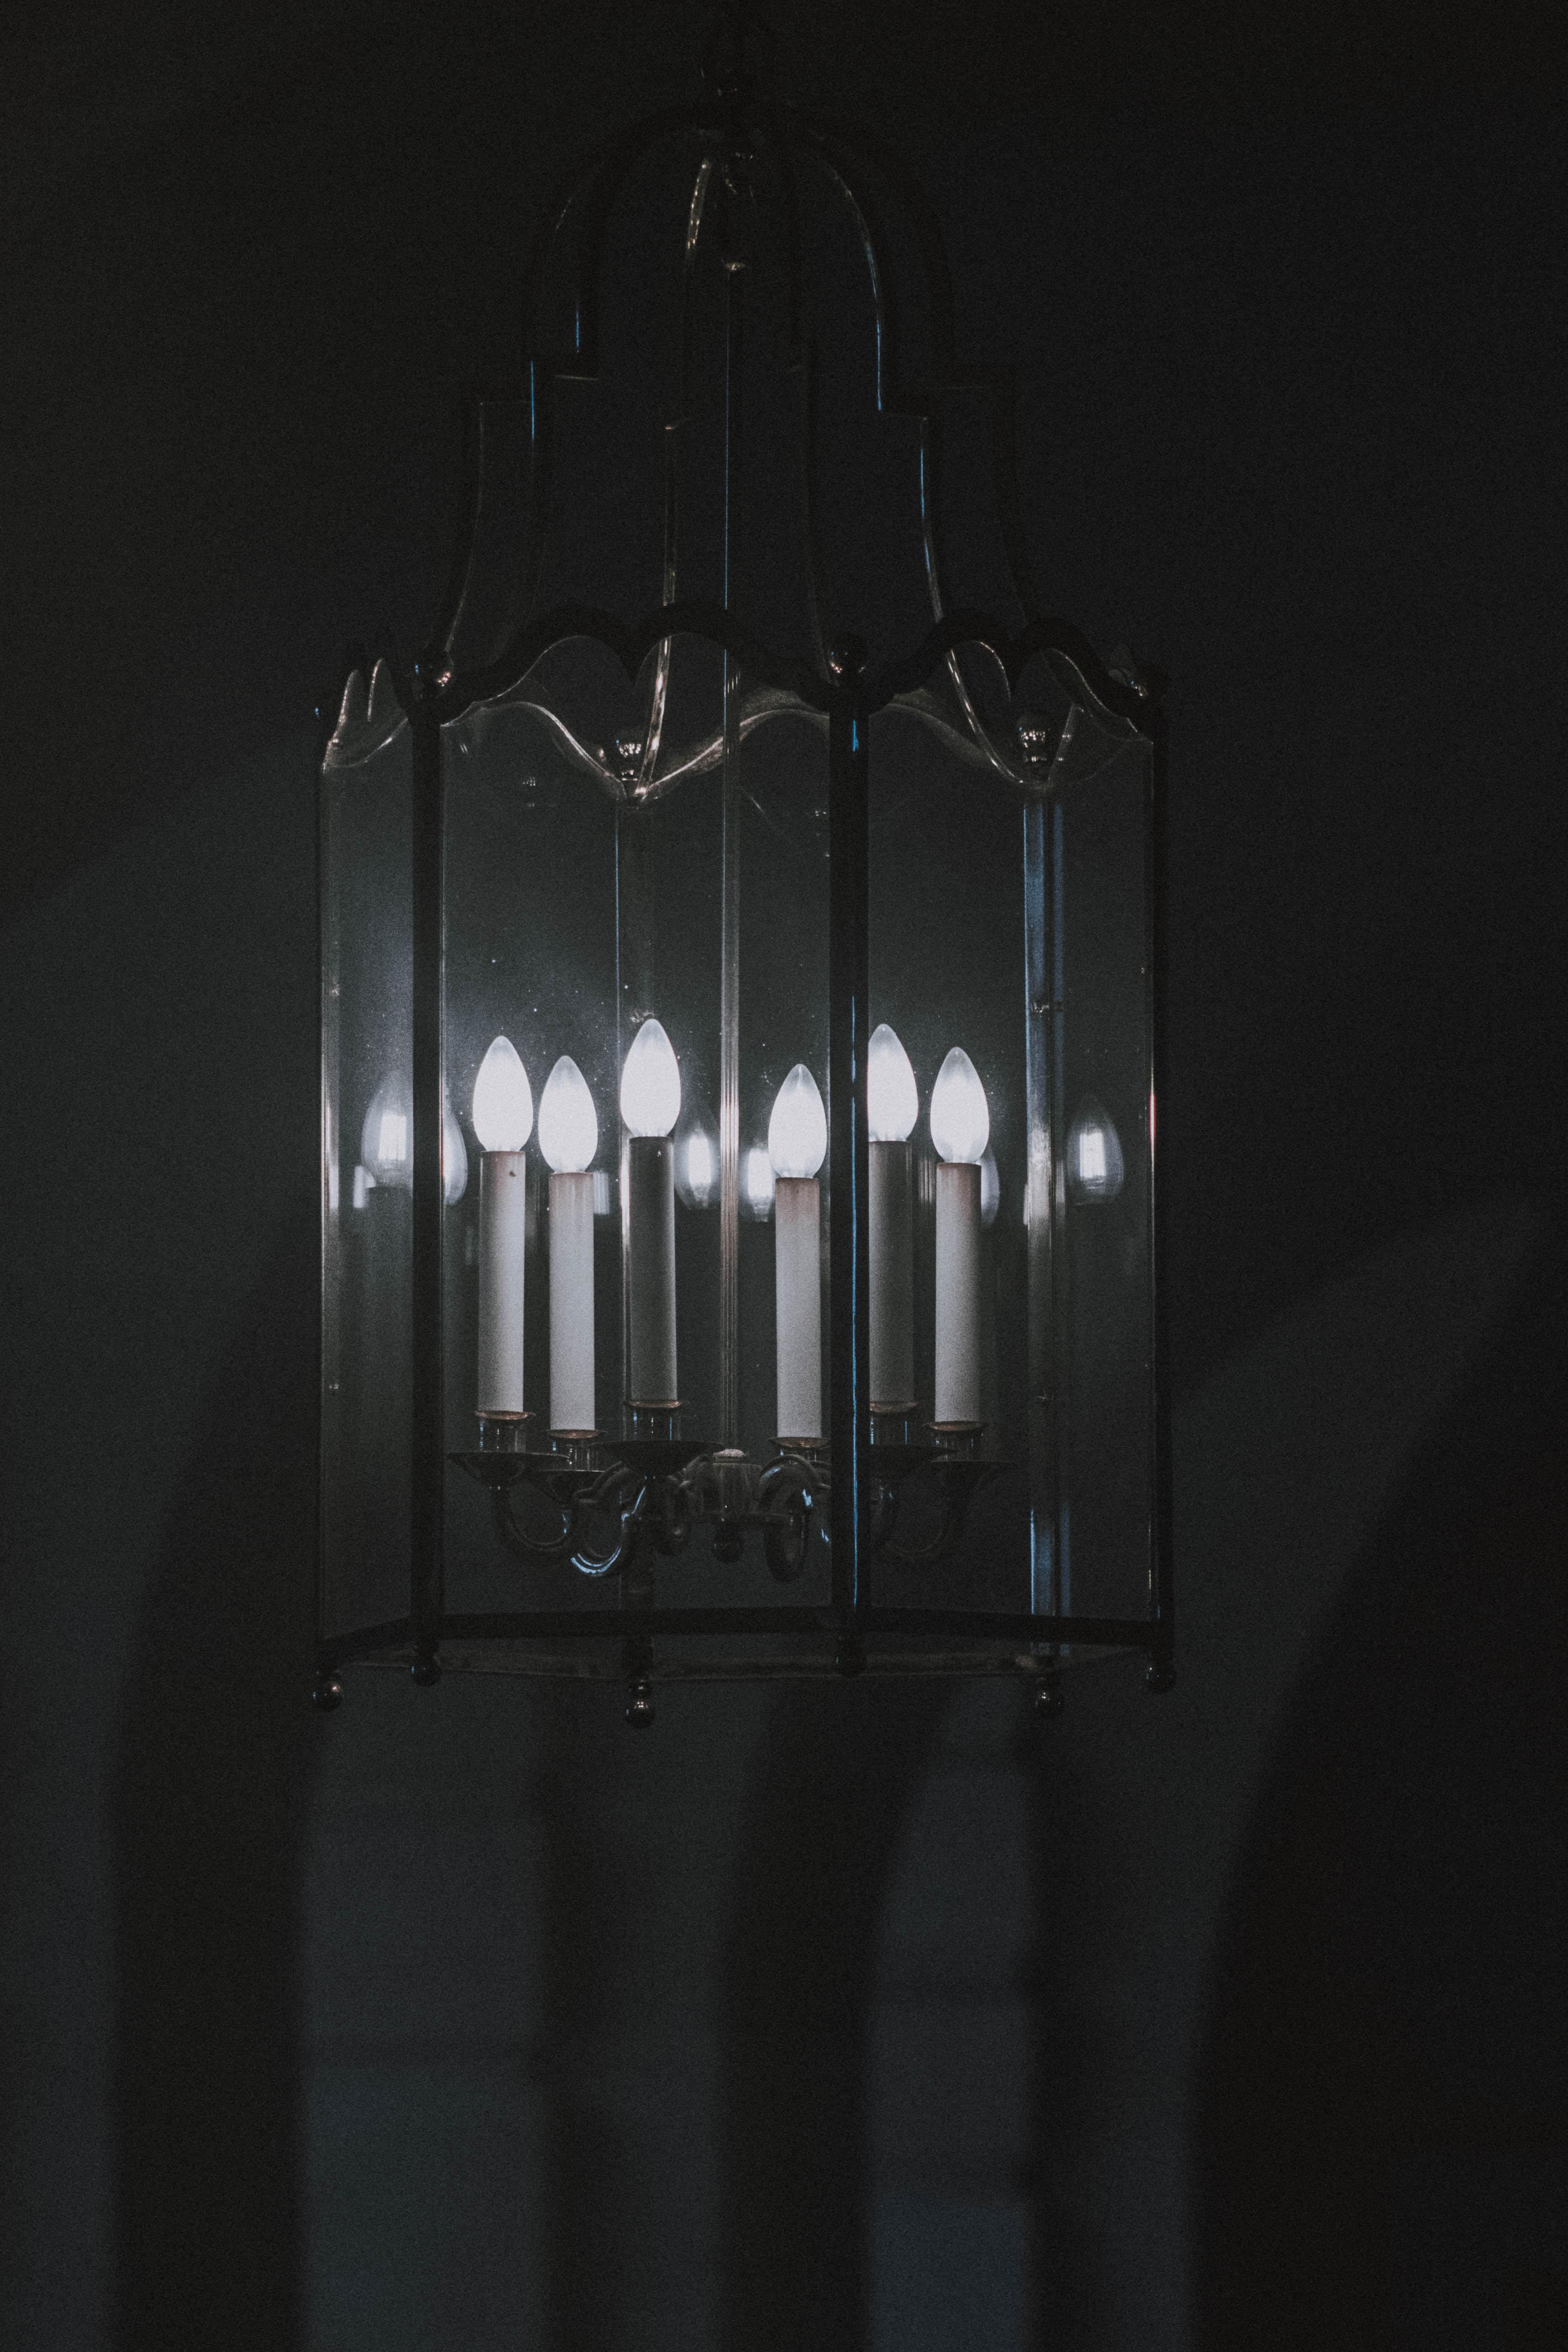 gray metal framed chandelier